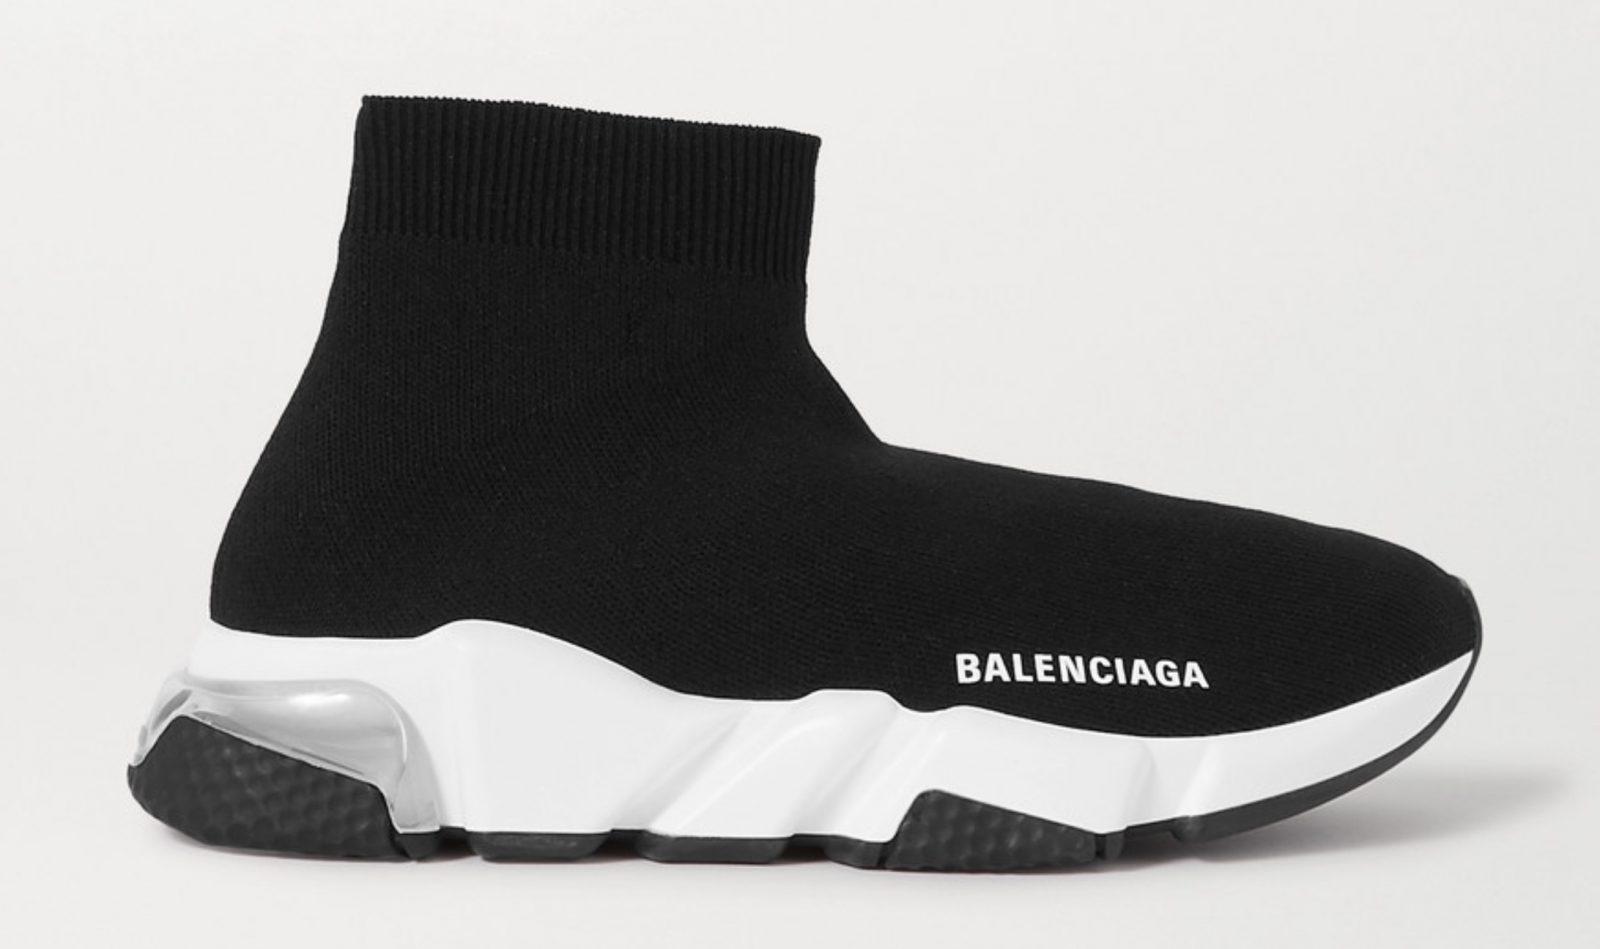 Balenciaga Sock Runner Black